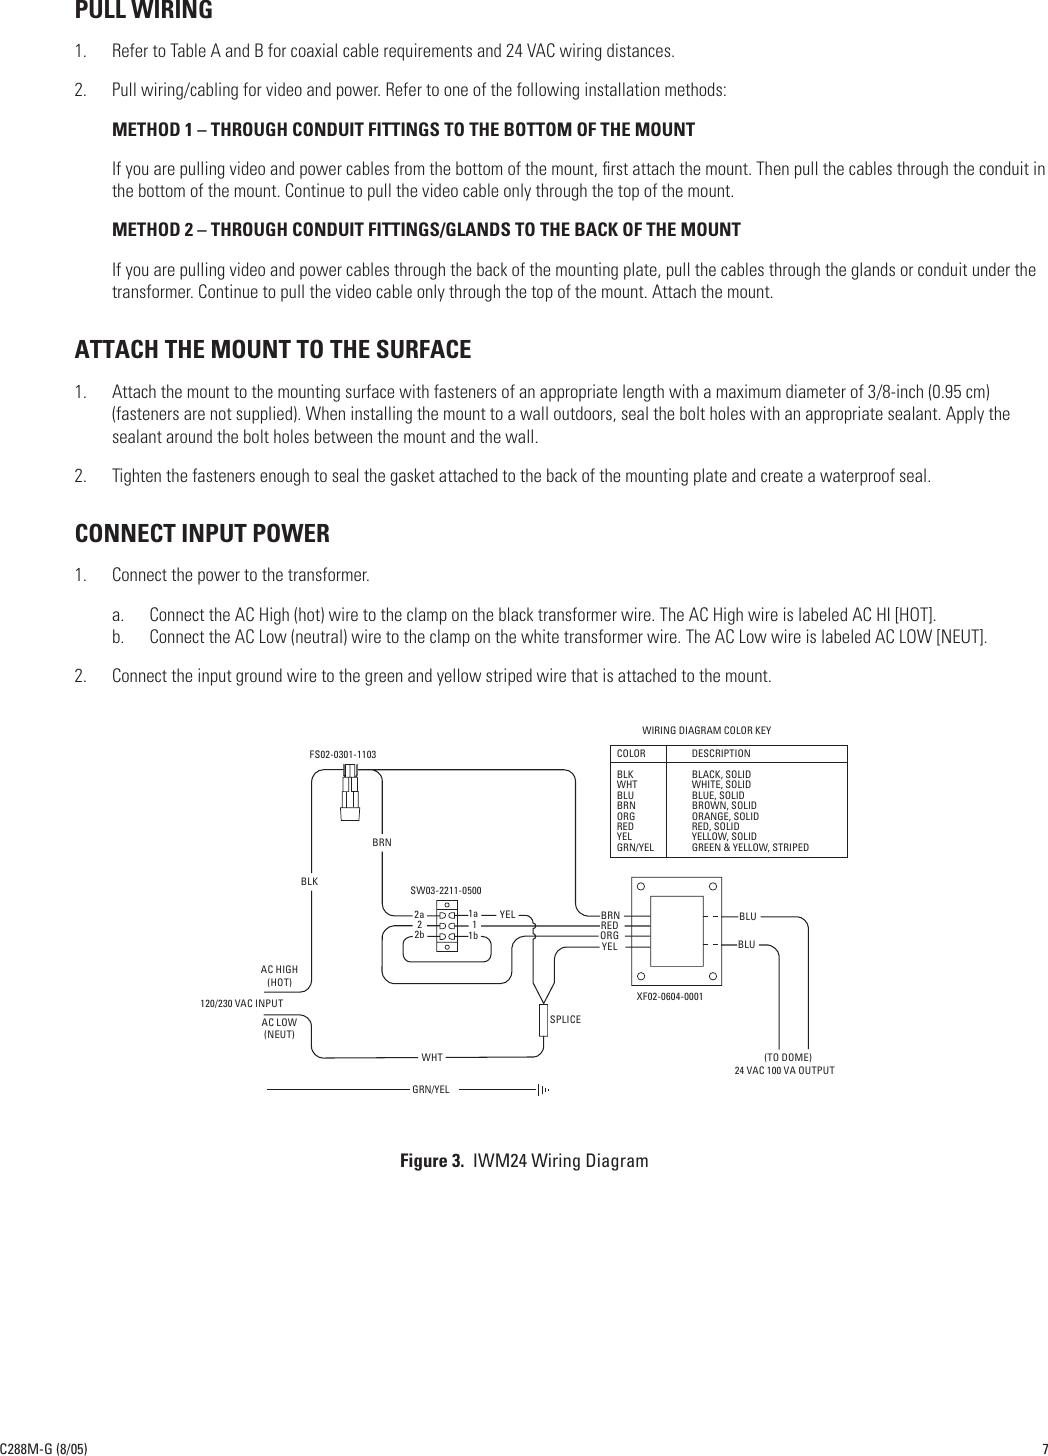 Enchanting pelco ptz camera wiring diagram pictures best image cool pelco camera wiring diagram images wiring diagram ideas cheapraybanclubmaster Choice Image